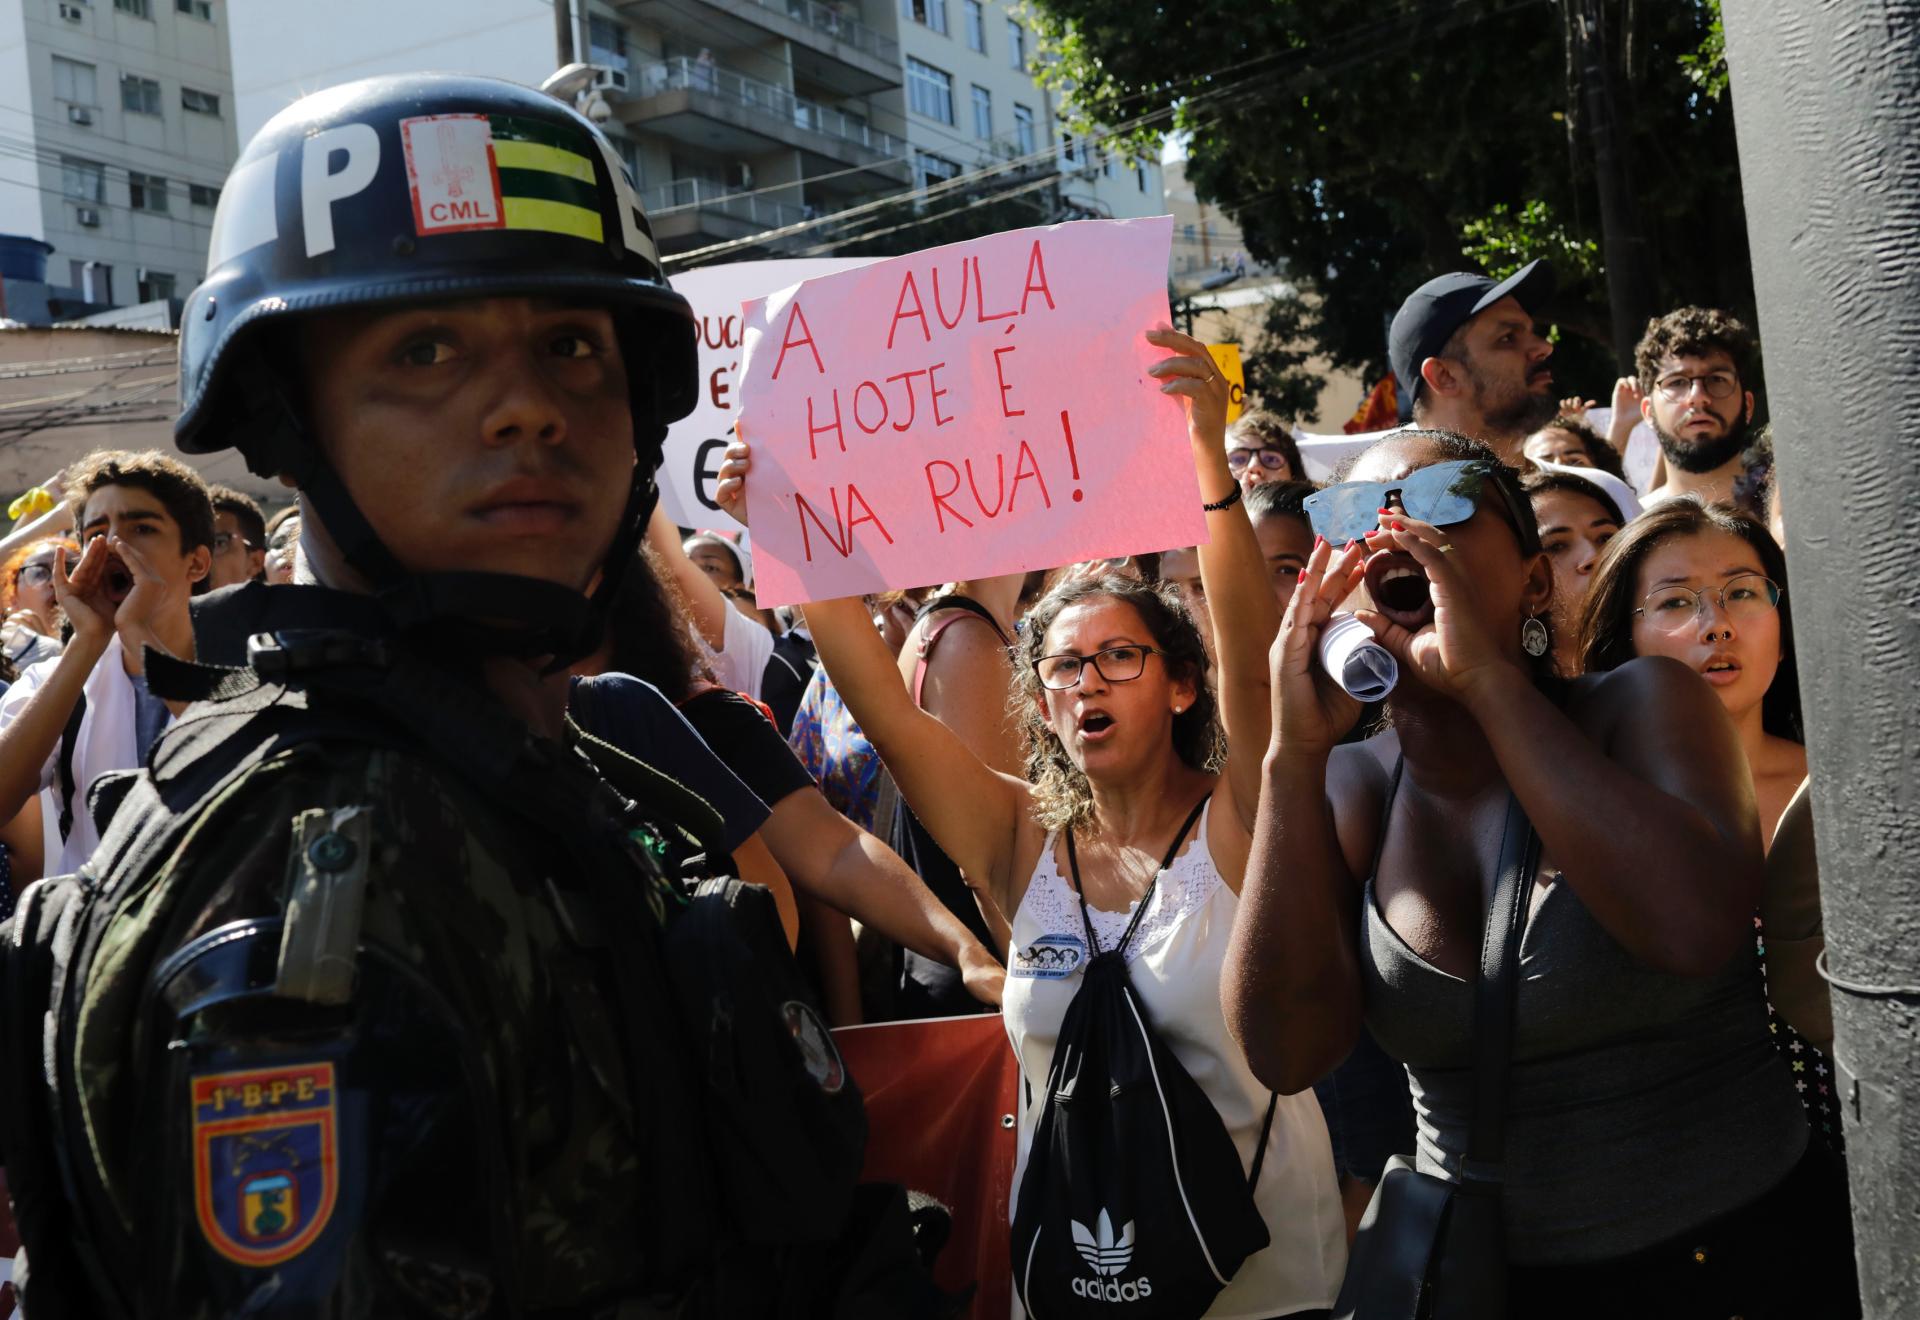 Westlake Legal Group ContentBroker_contentid-83a98fb5c48a4e6384ae48e781c8aad5-1 Students in Brazil protest school budget cuts RIO DE JANEIRO fox-news/world/world-regions/americas fox-news/world fnc/world fnc Associated Press article 03a03315-03b1-575f-a464-40f75dcebe18